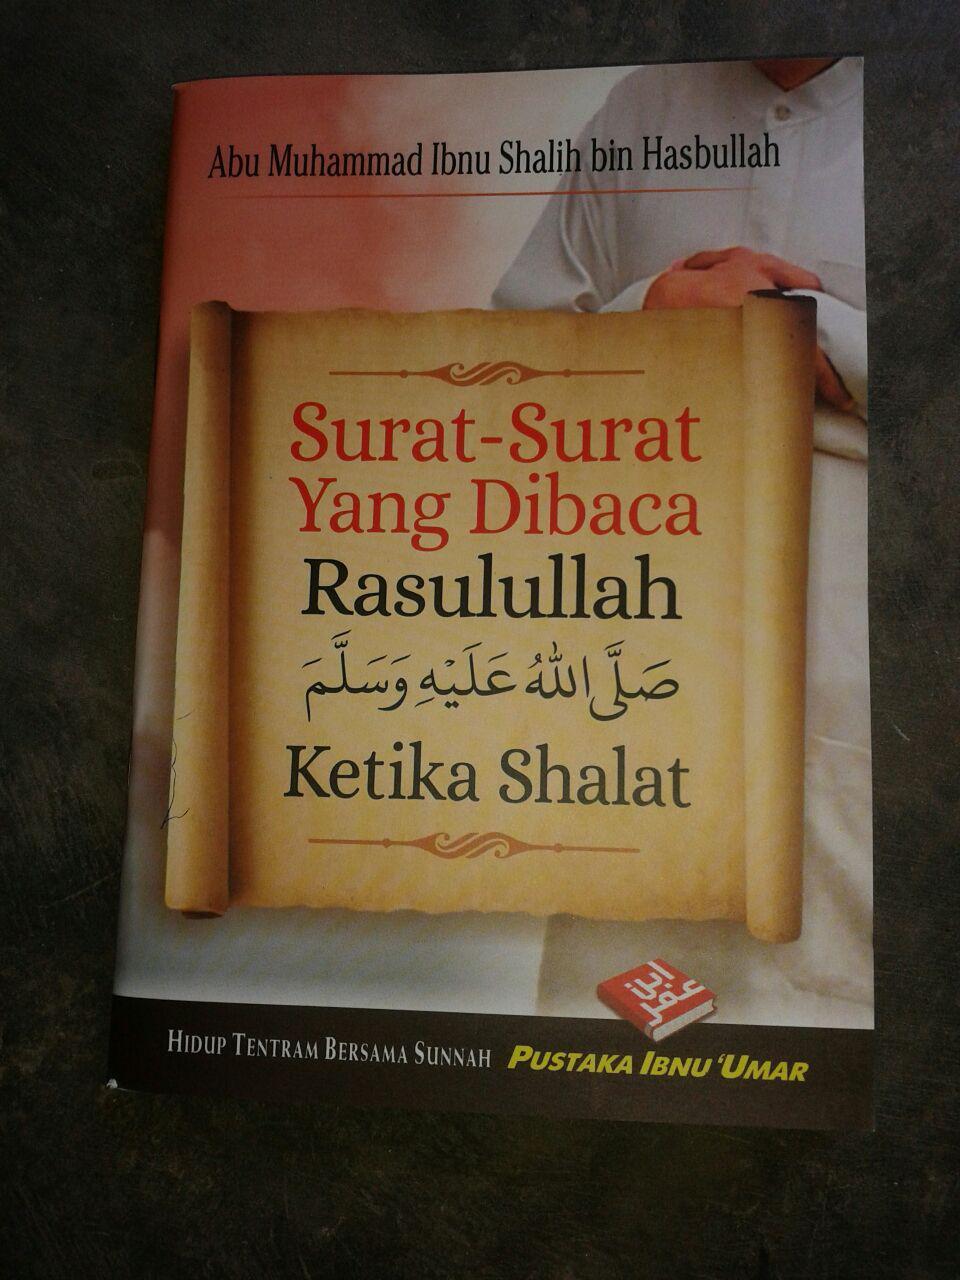 Buku Saku Surat Surat Yang Dibaca Rasulullah Ketika Shalat cover